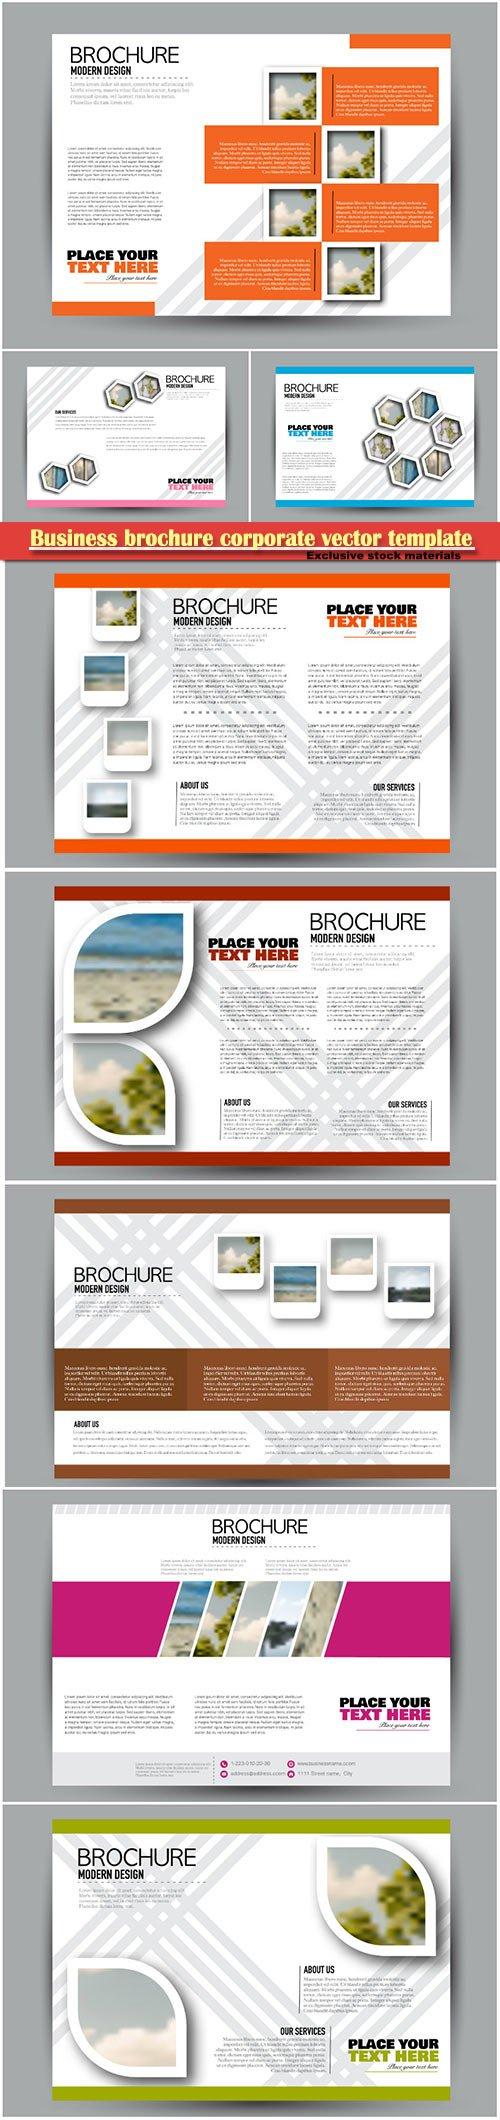 Business brochure corporate vector template, magazine flyer mockup # 16